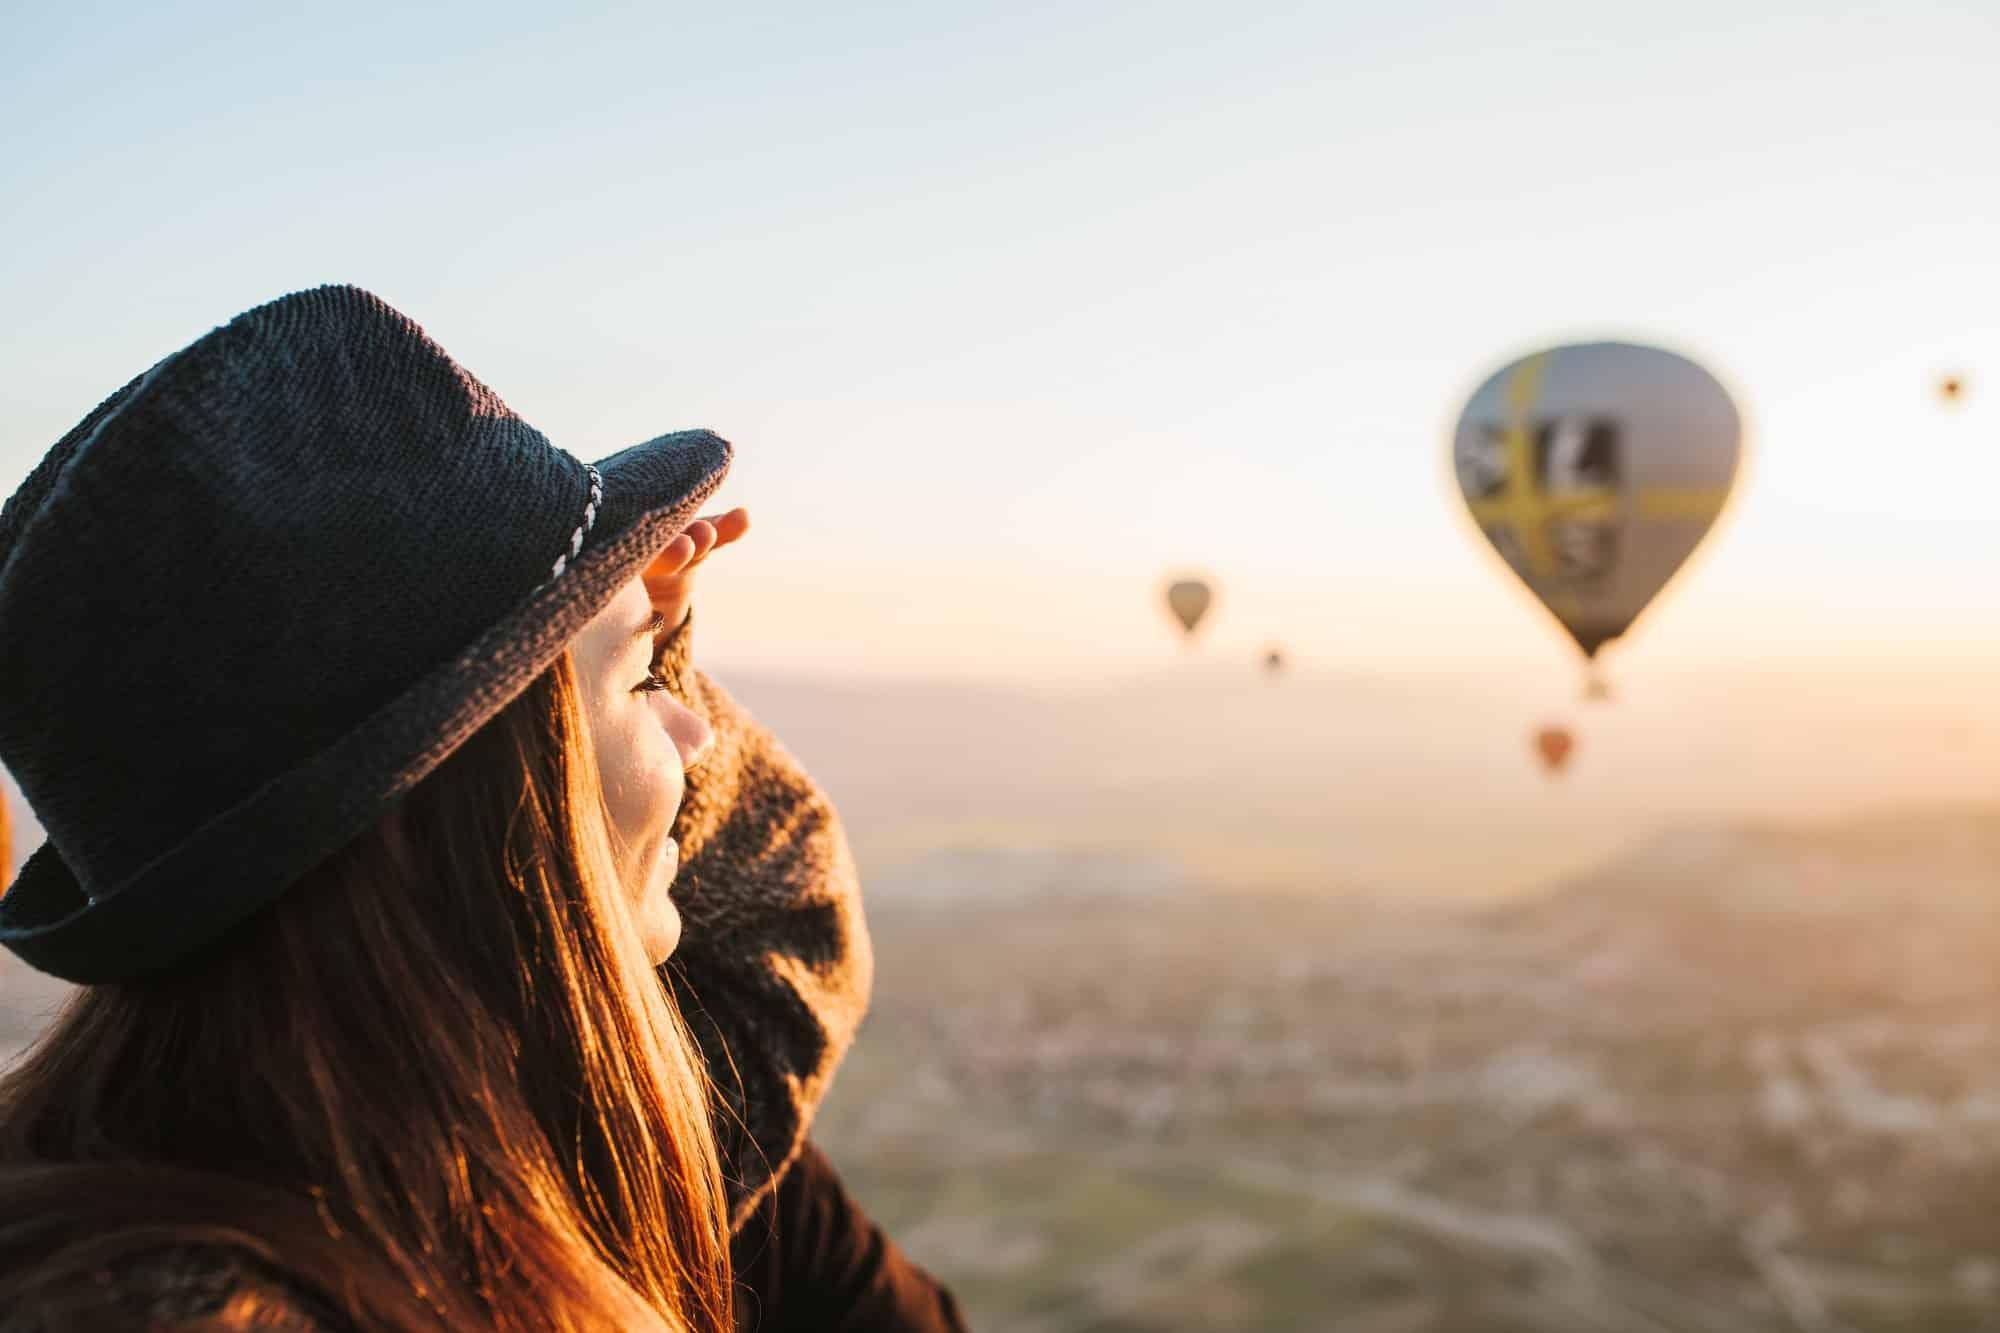 Girl enjoys hot air balloon flight